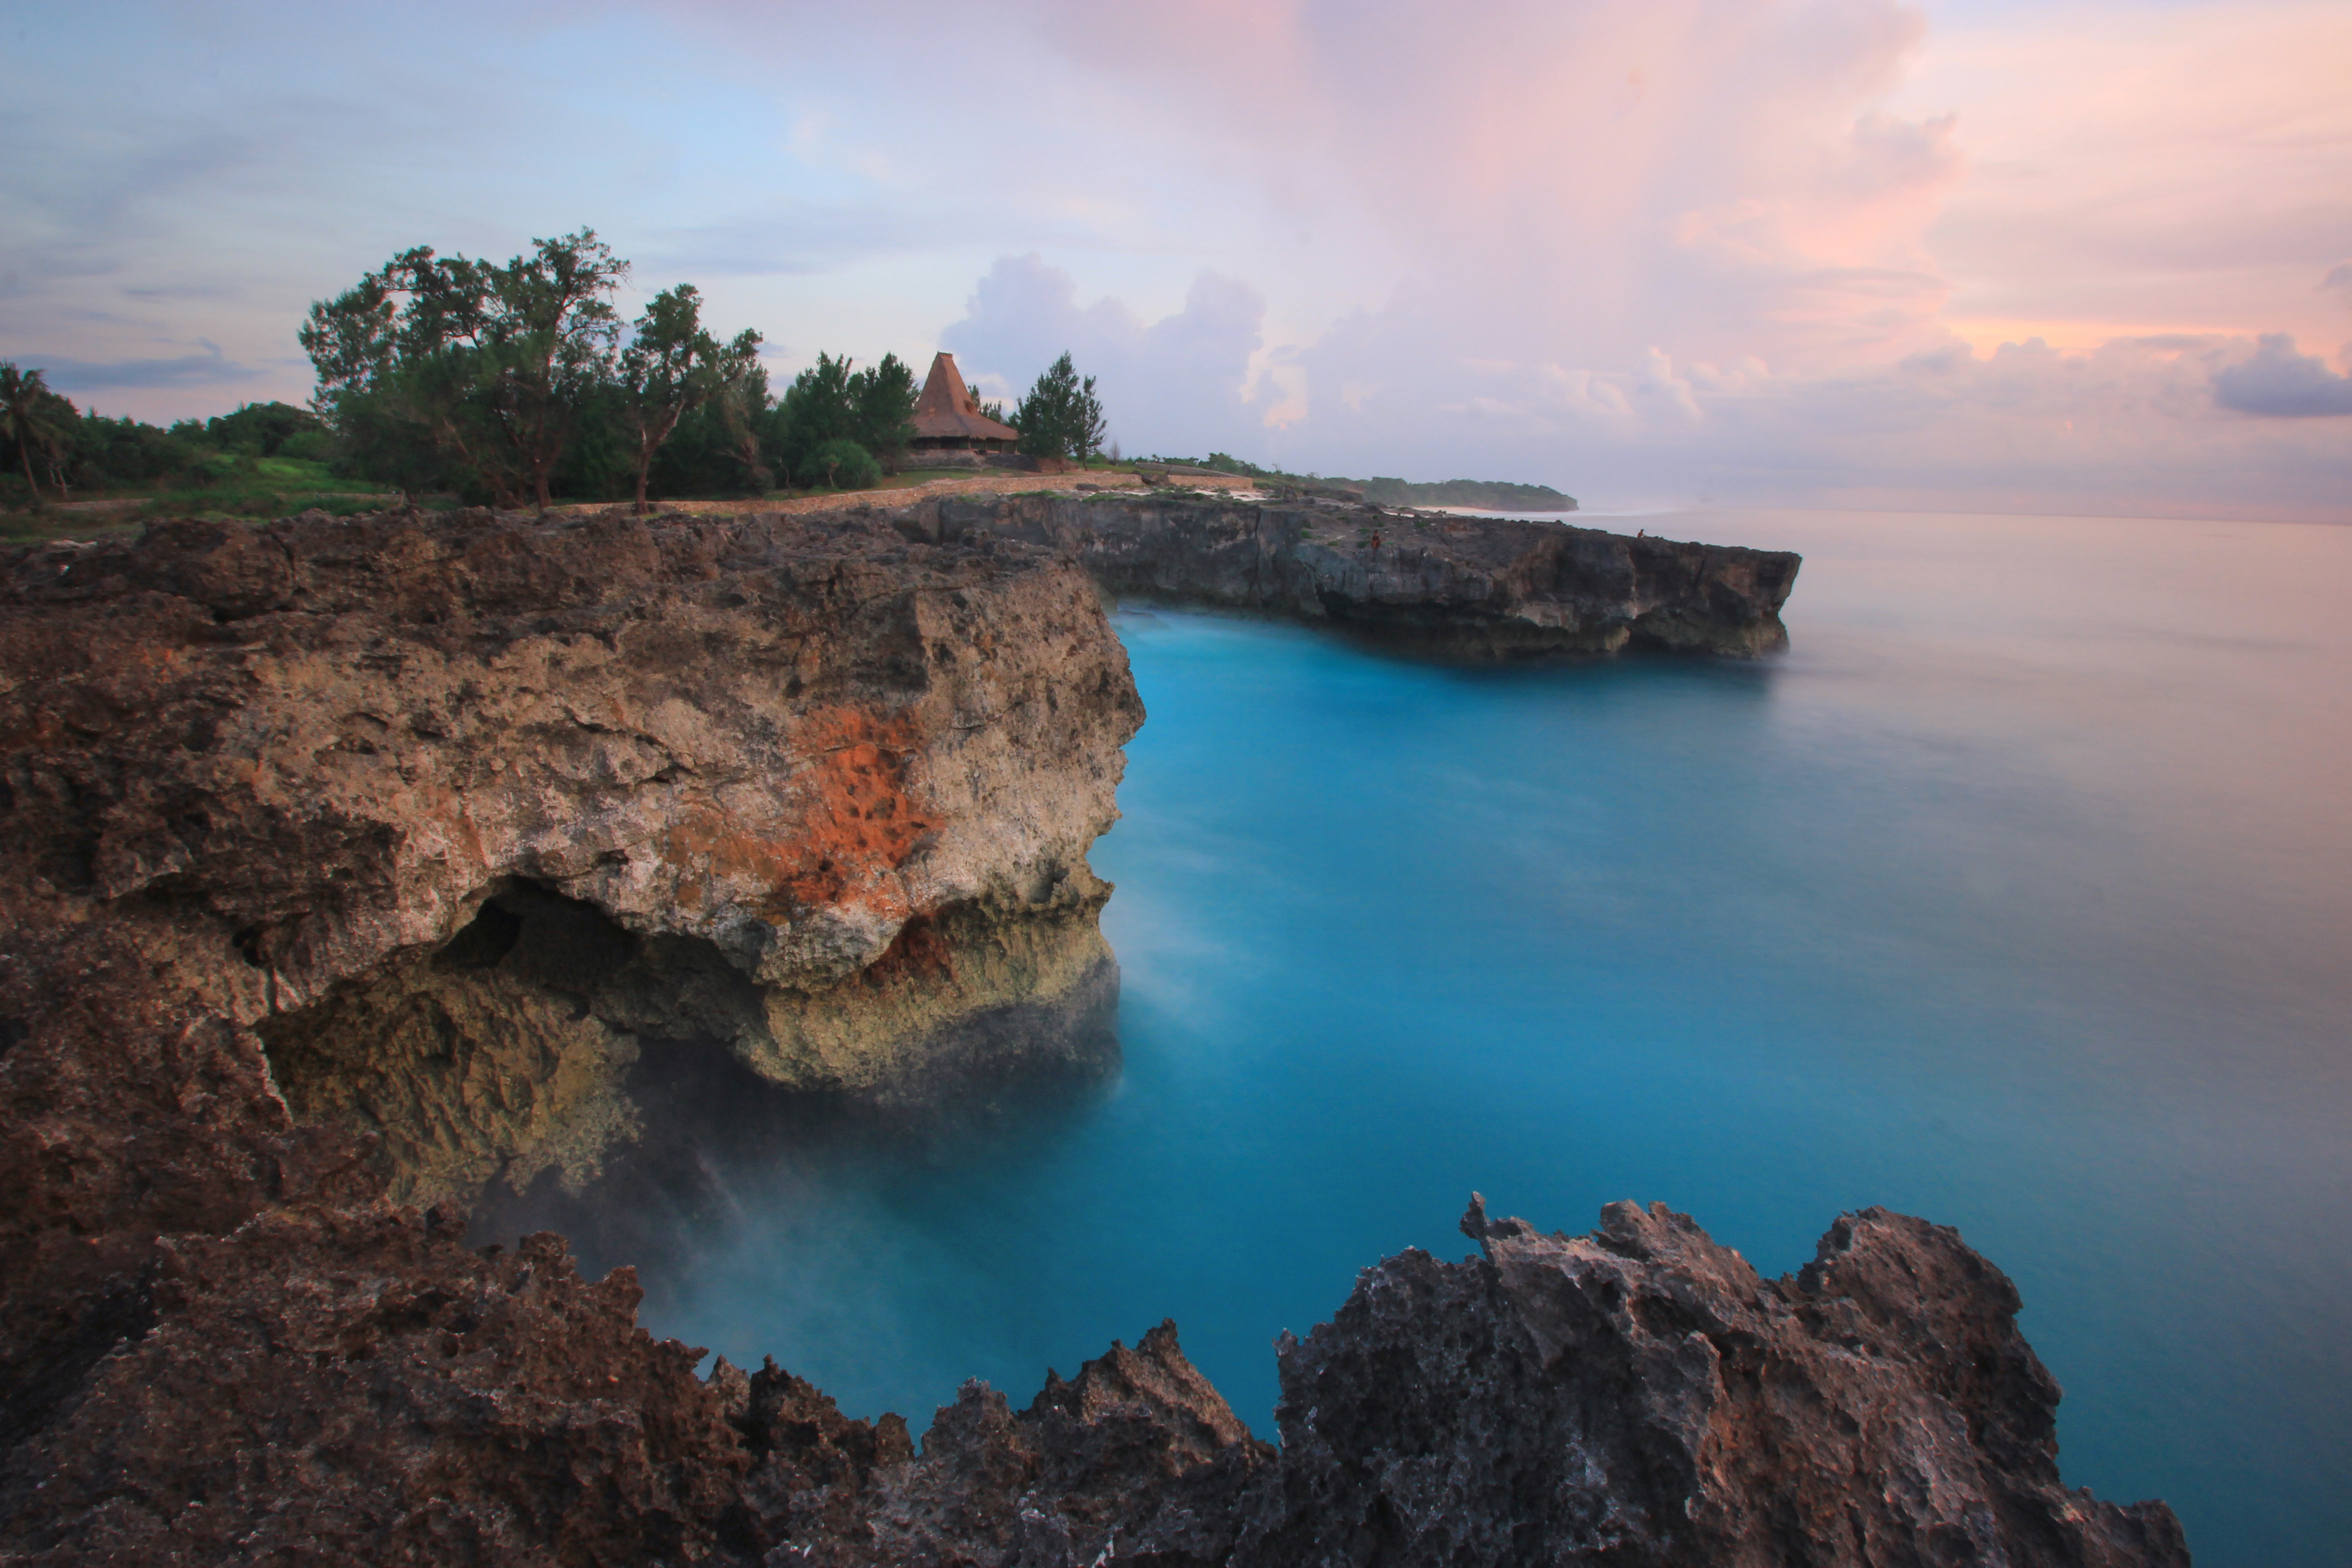 File:Pantai Mandorak, Sumba Barat Daya.jpg - Wikimedia Commons